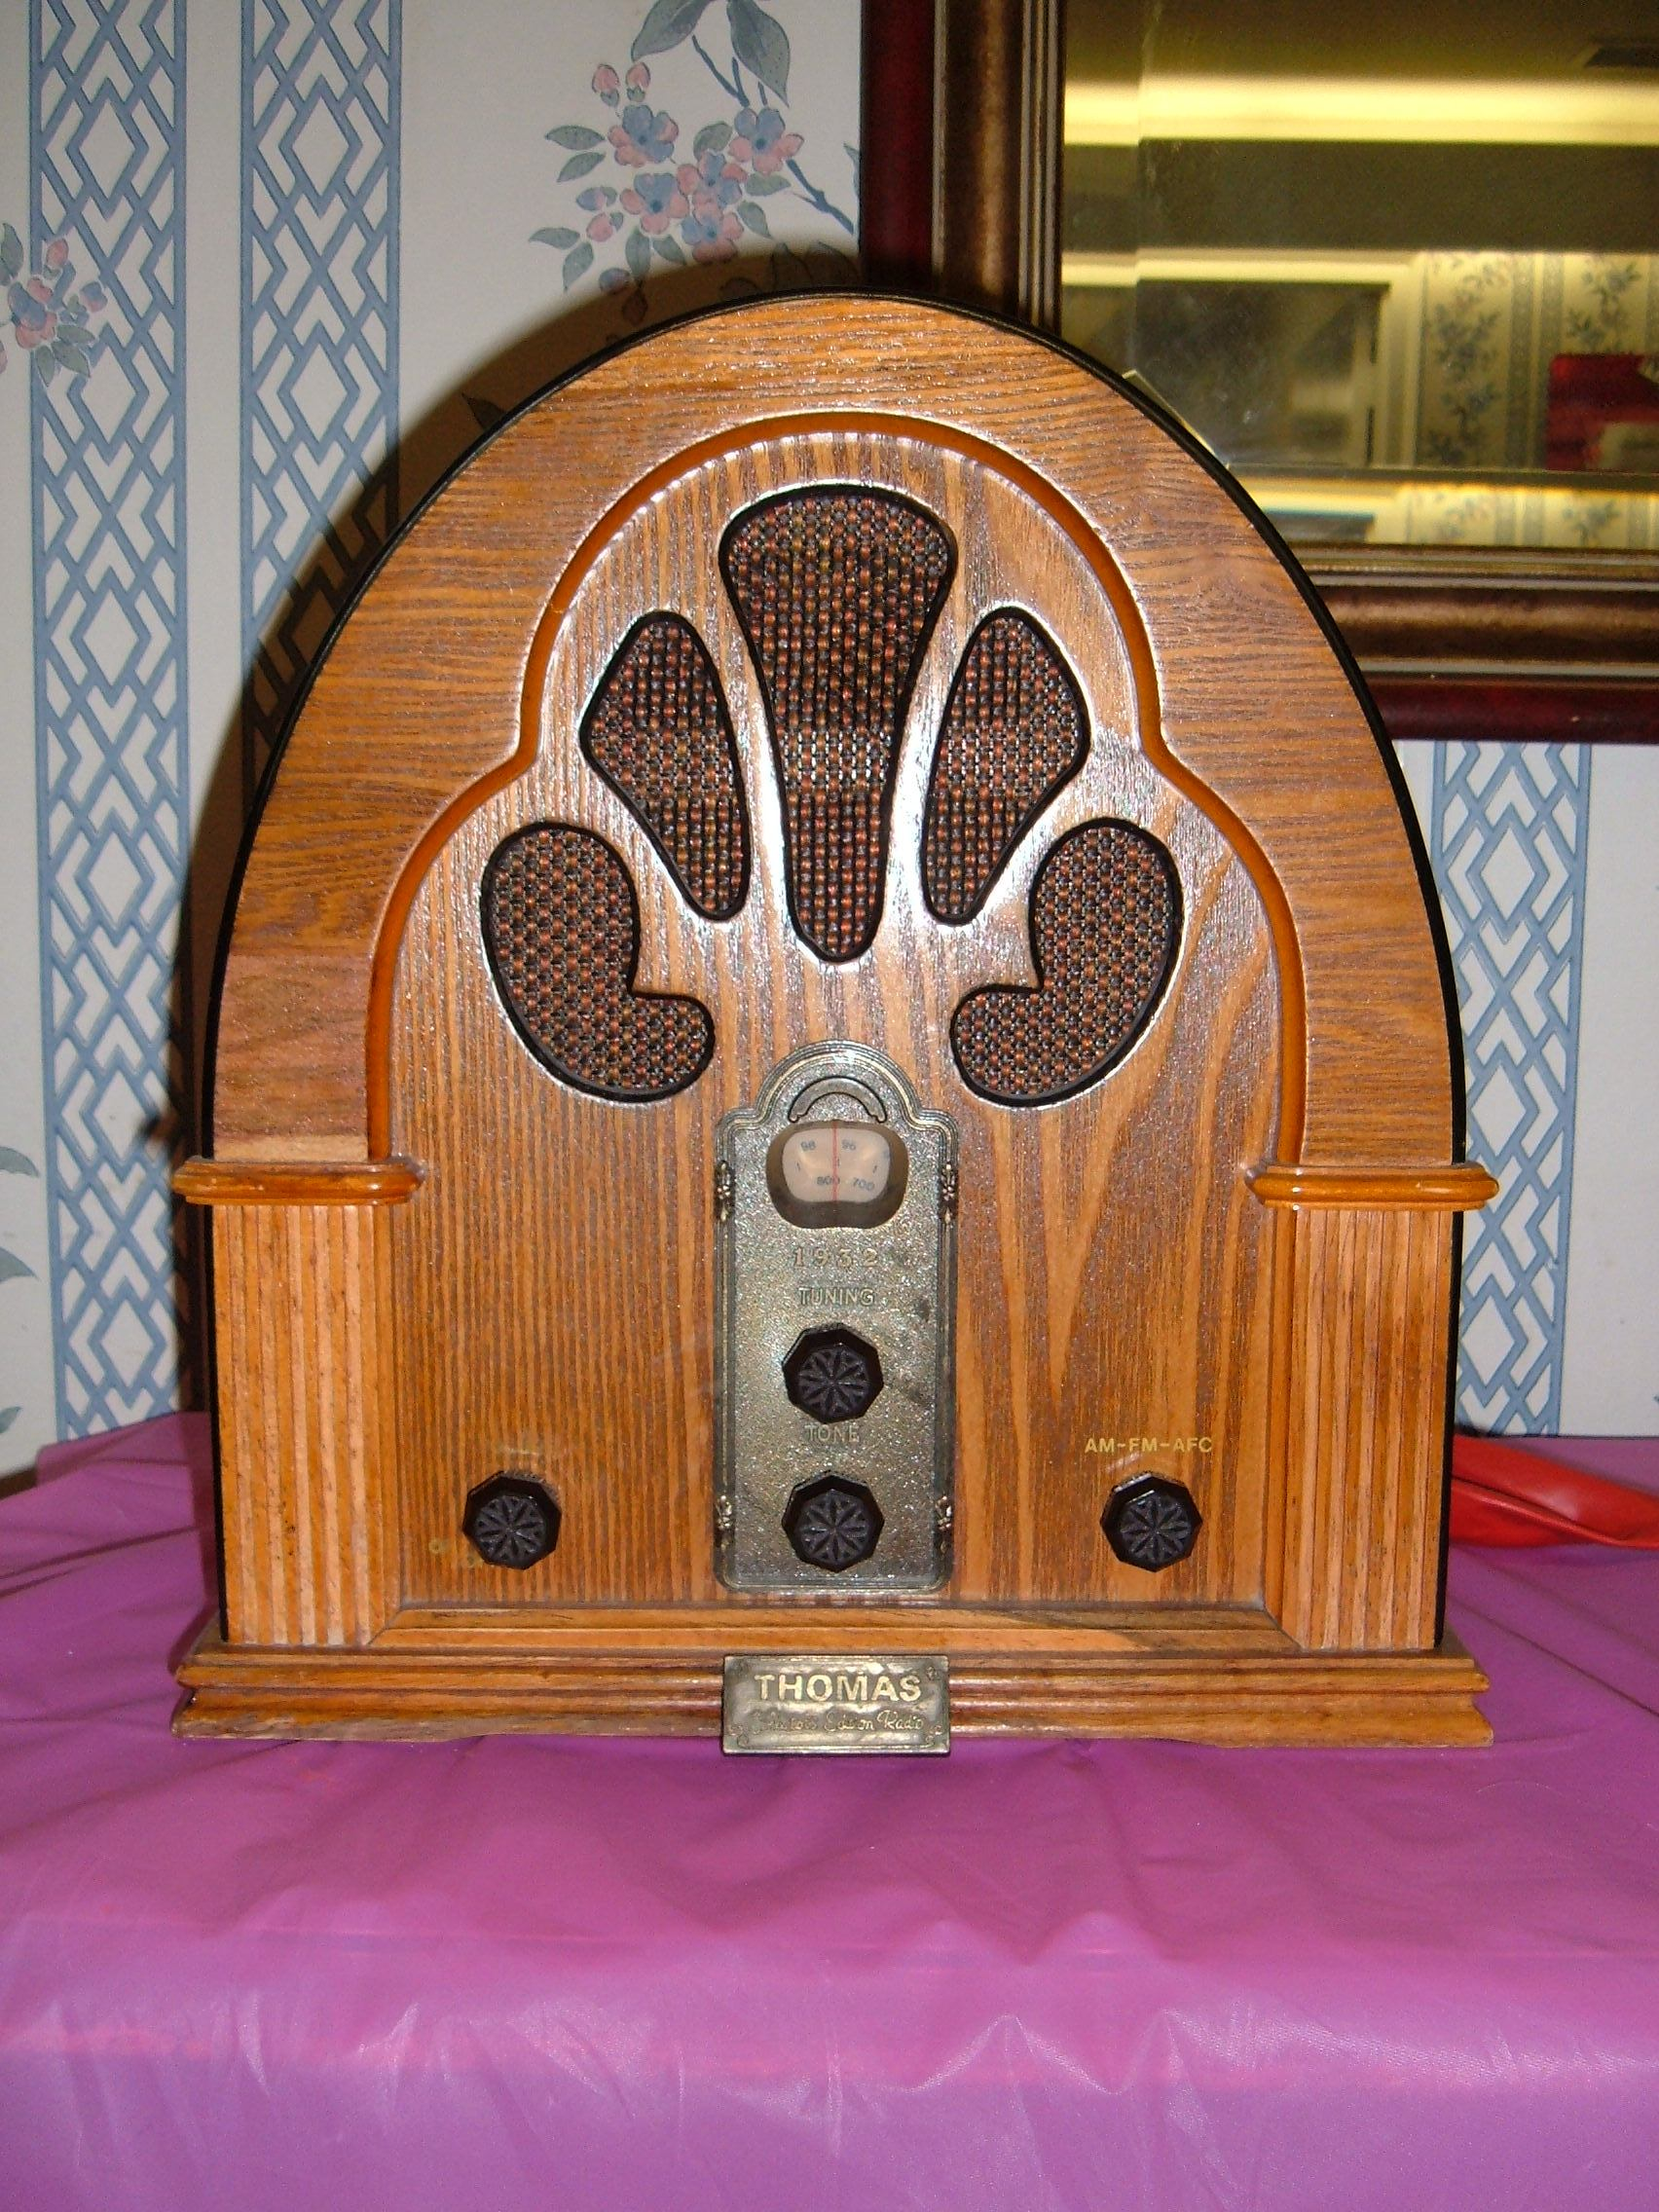 http://upload.wikimedia.org/wikipedia/commons/1/10/1932_Thomas_radio.JPG